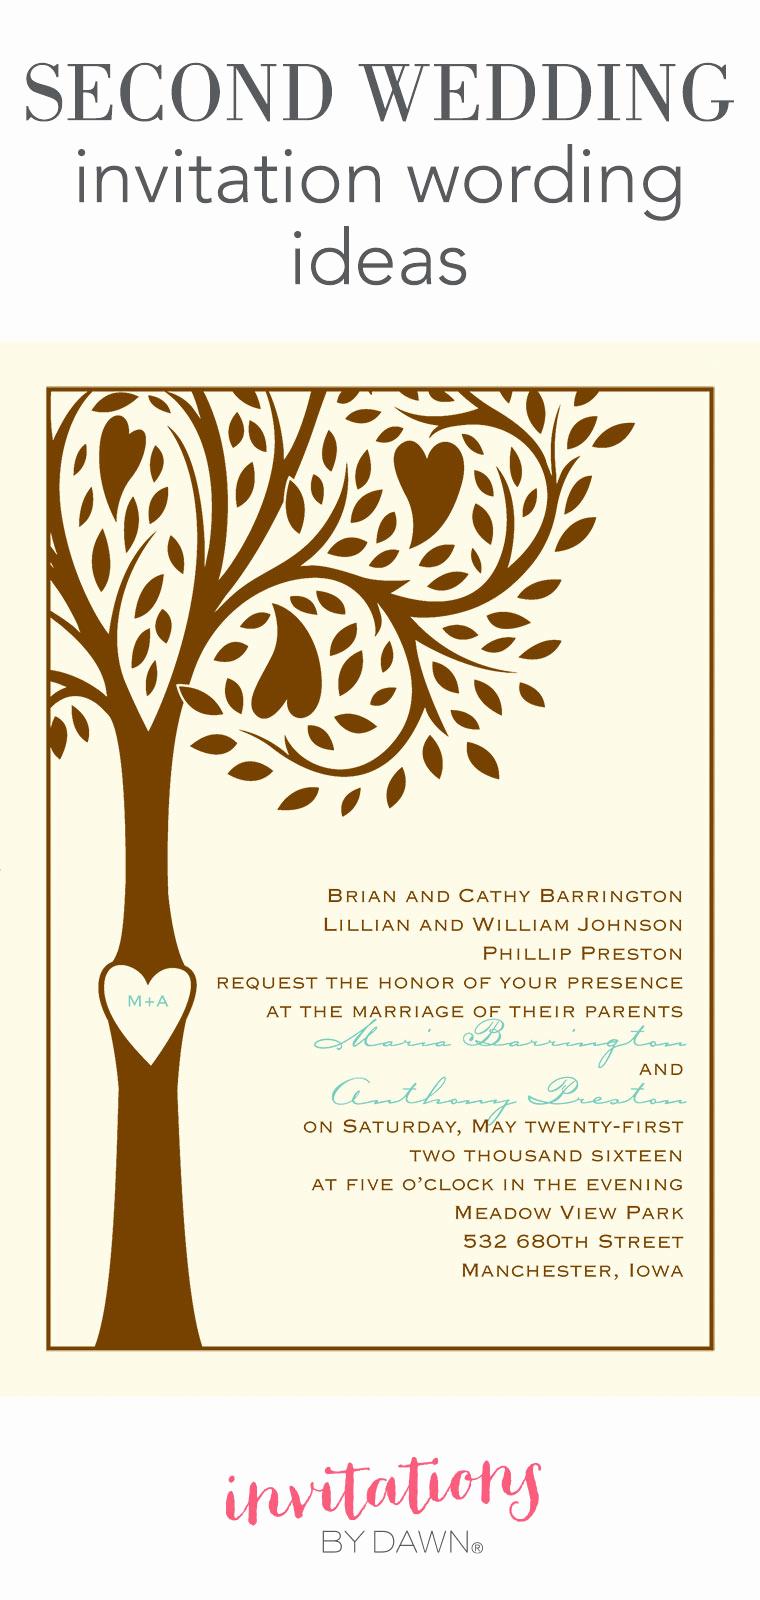 Witty Wedding Invitation Wording Elegant Second Wedding Invitation Wording